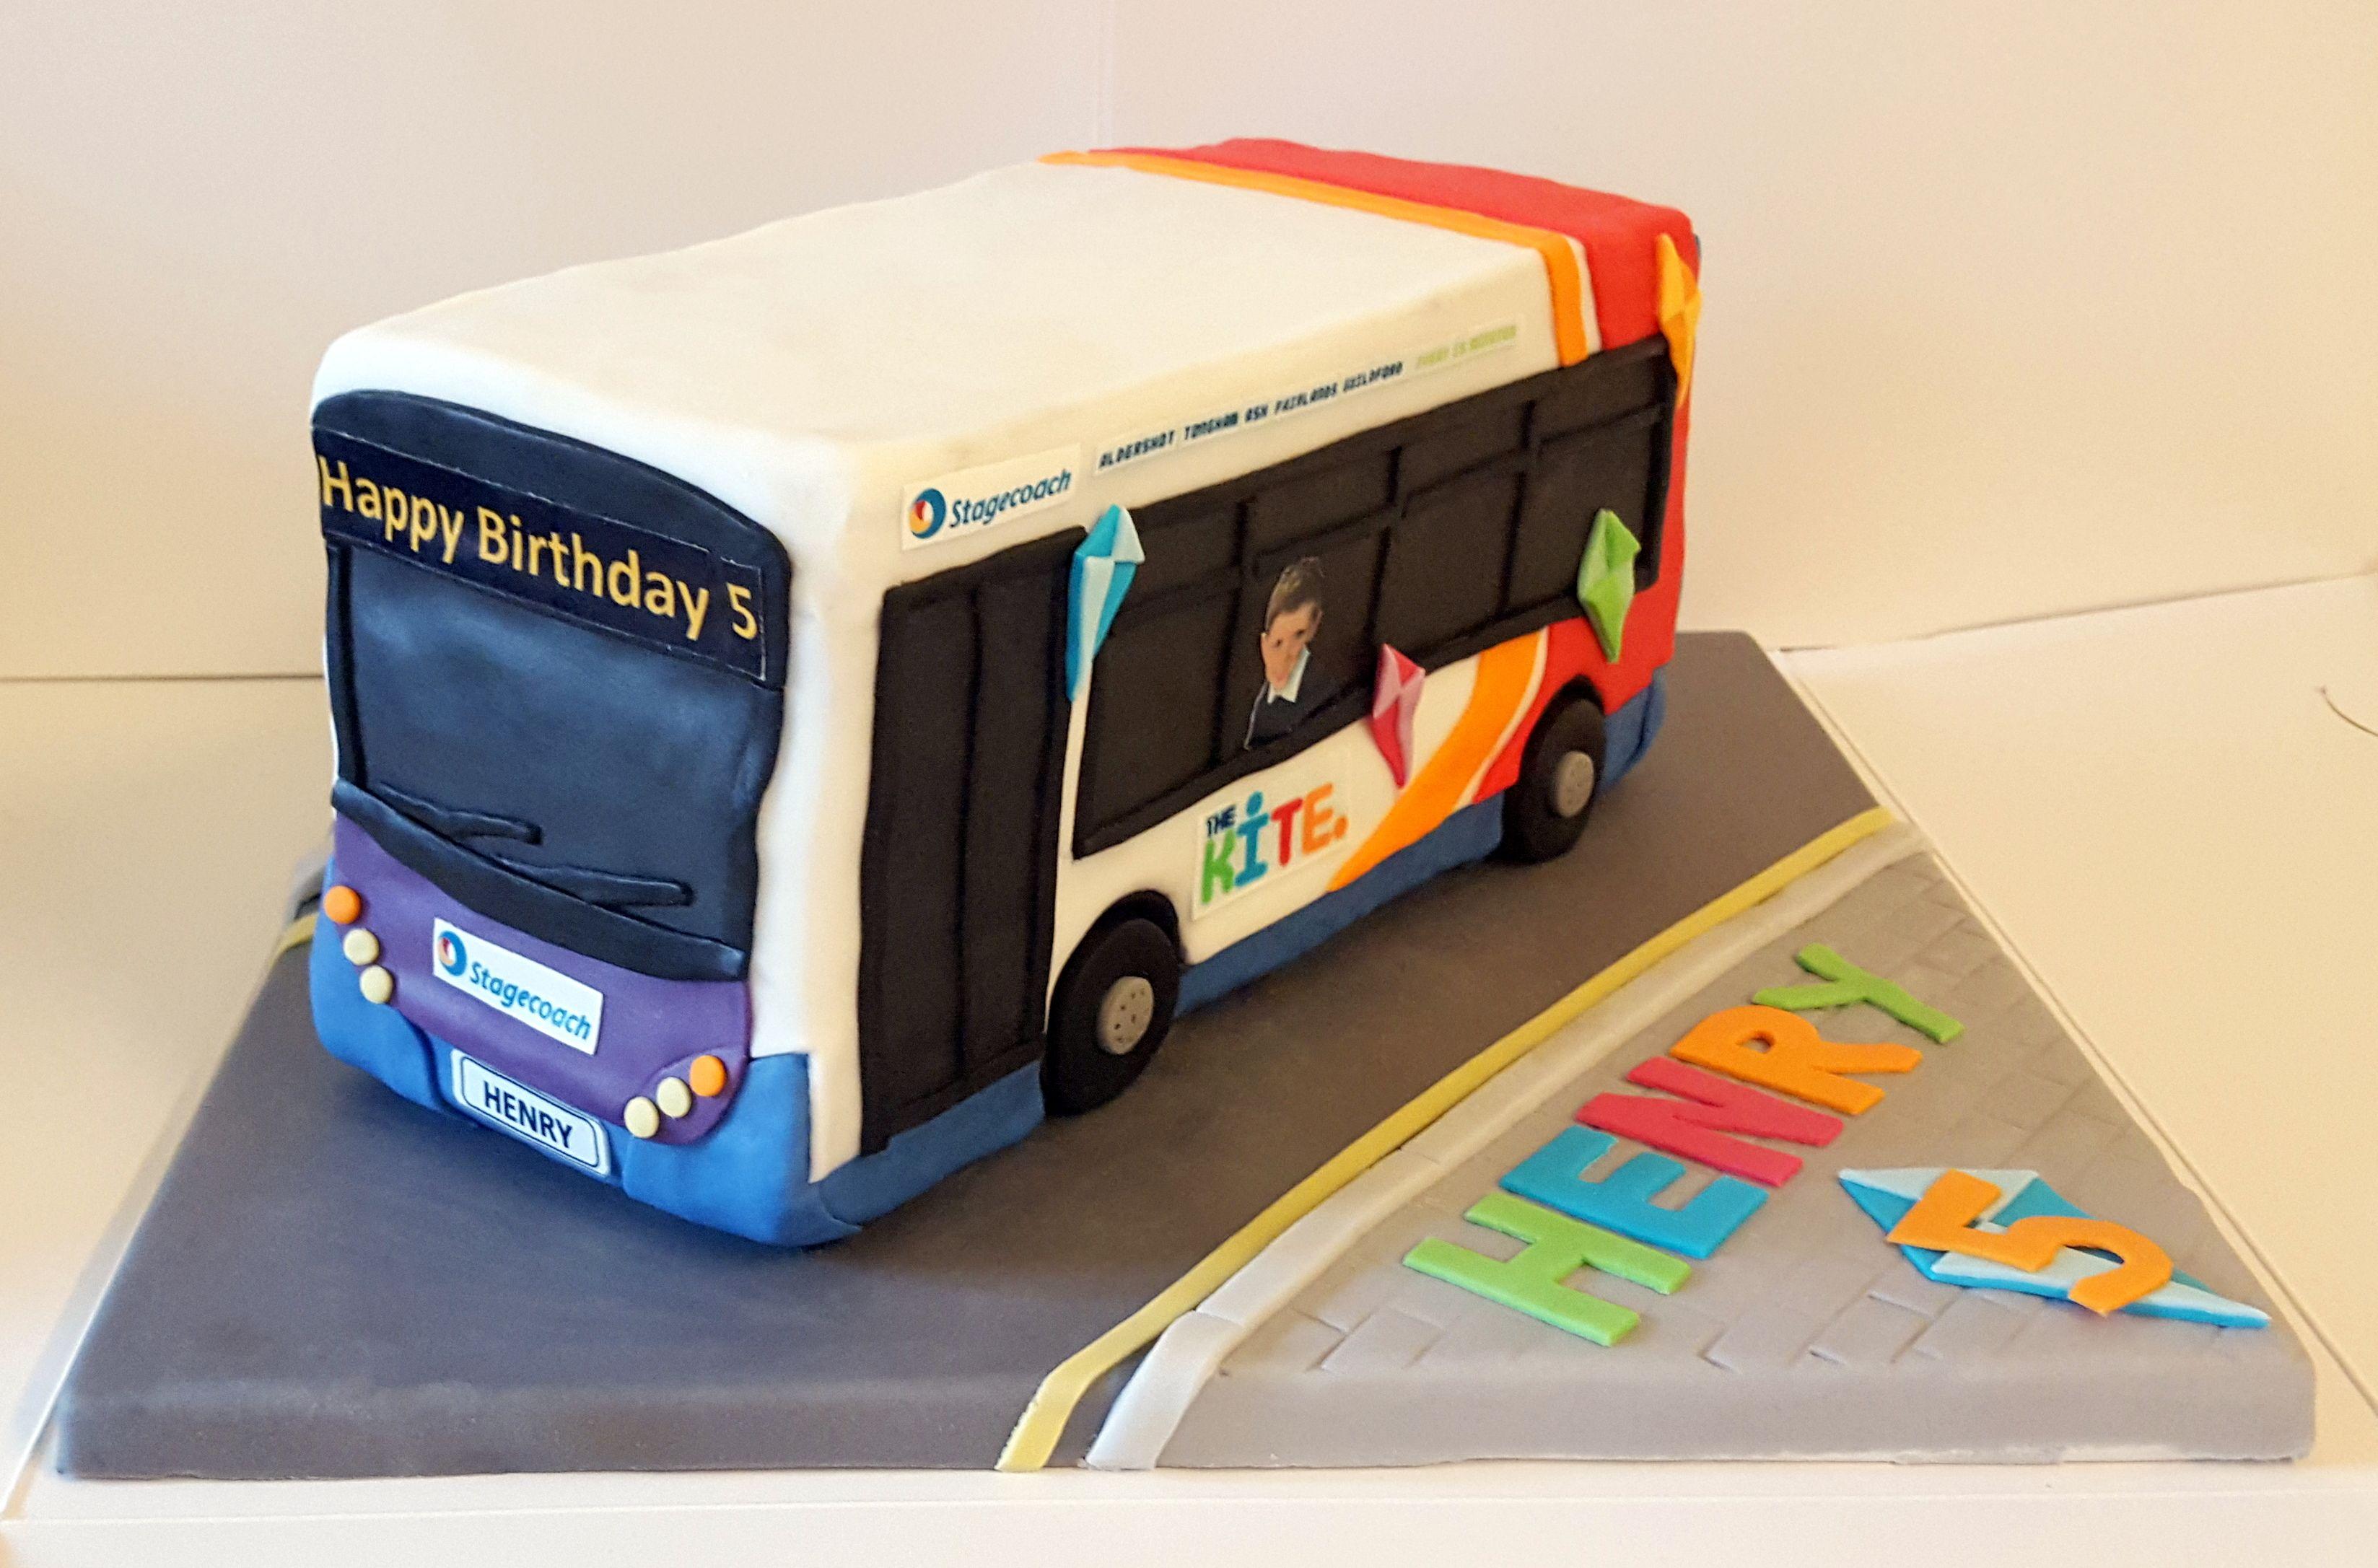 Tremendous Stagecoach Bus Cake Bolos Bus Cake Cake Birthday Cakes For Men Funny Birthday Cards Online Barepcheapnameinfo